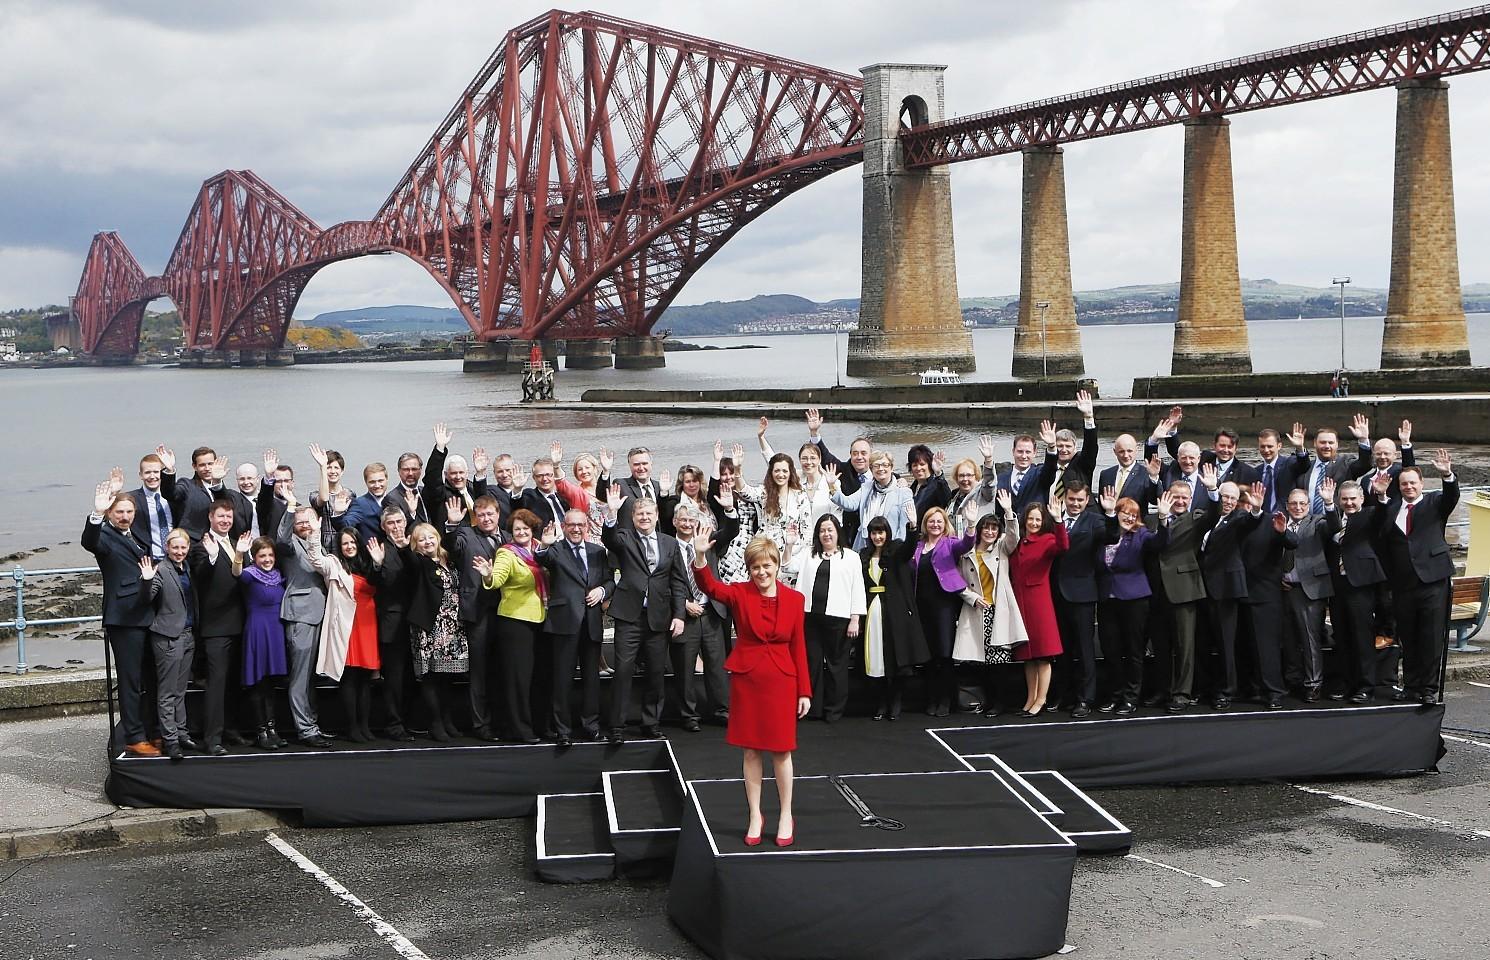 Nicola Sturgeon with the SNP's 56 MPs